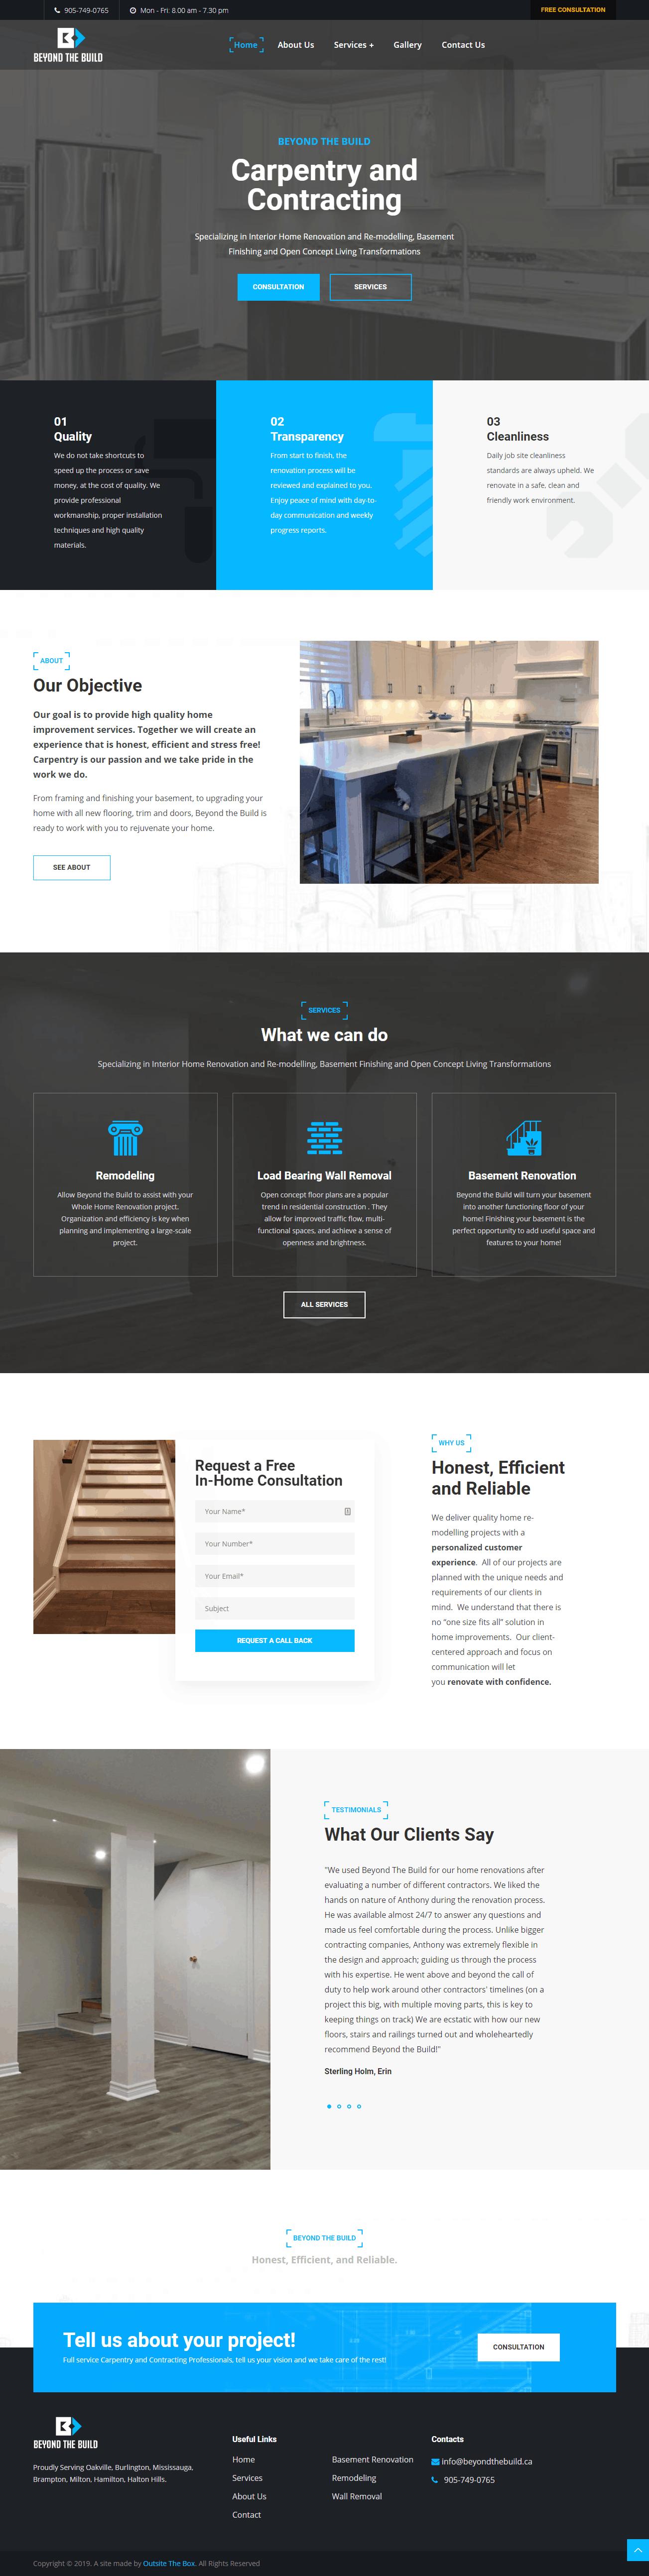 best homepage layout web design